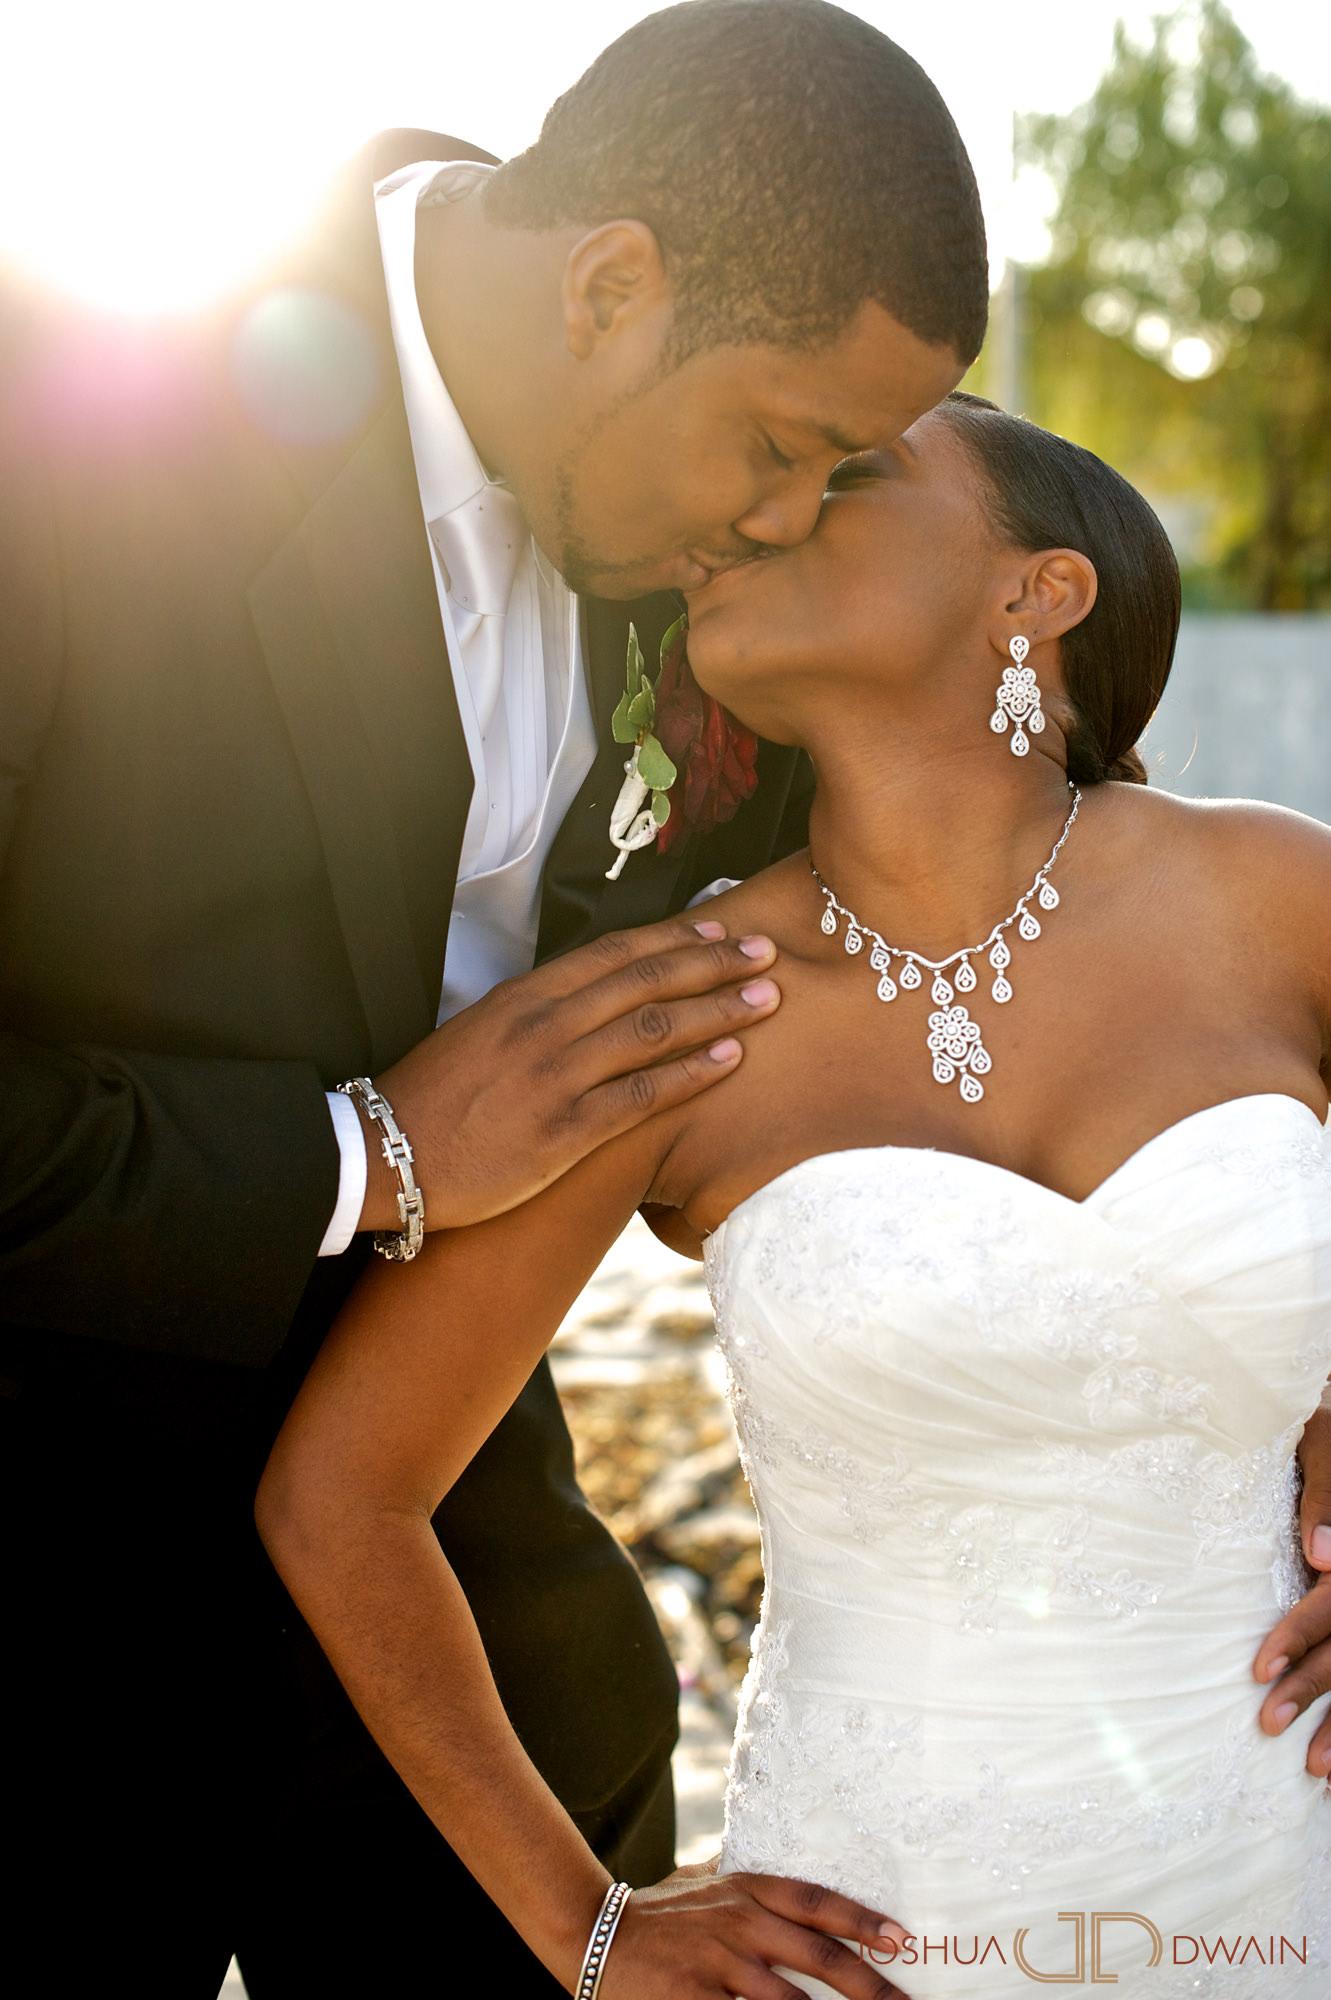 natifia-don-024-greentree-country-clubnew-rochelle-new-york-wedding-photographer-joshua-dwain-20101023_dn_1007